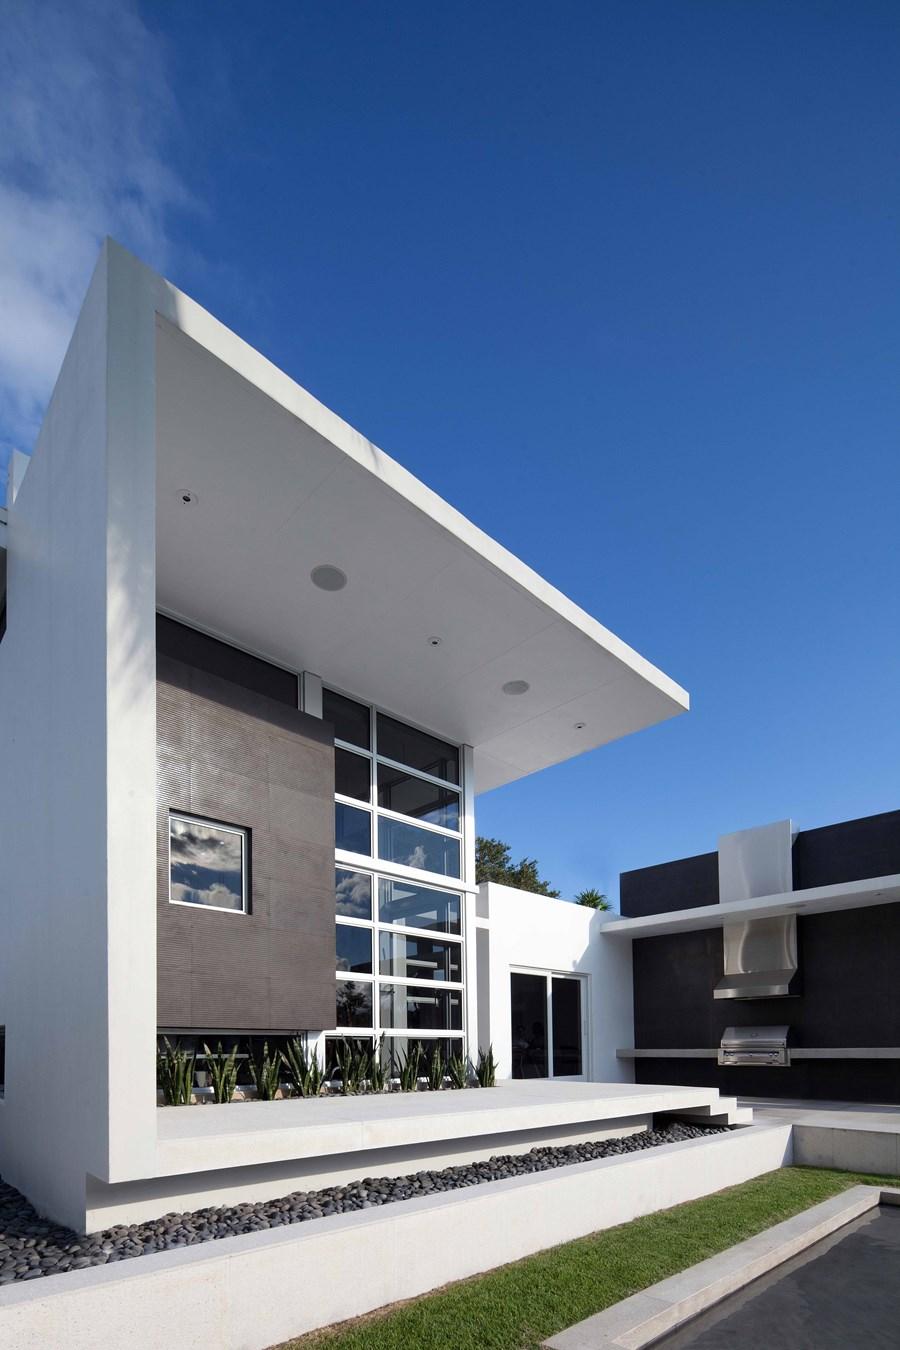 Lakewood Art Studio by KZ Architecture 21